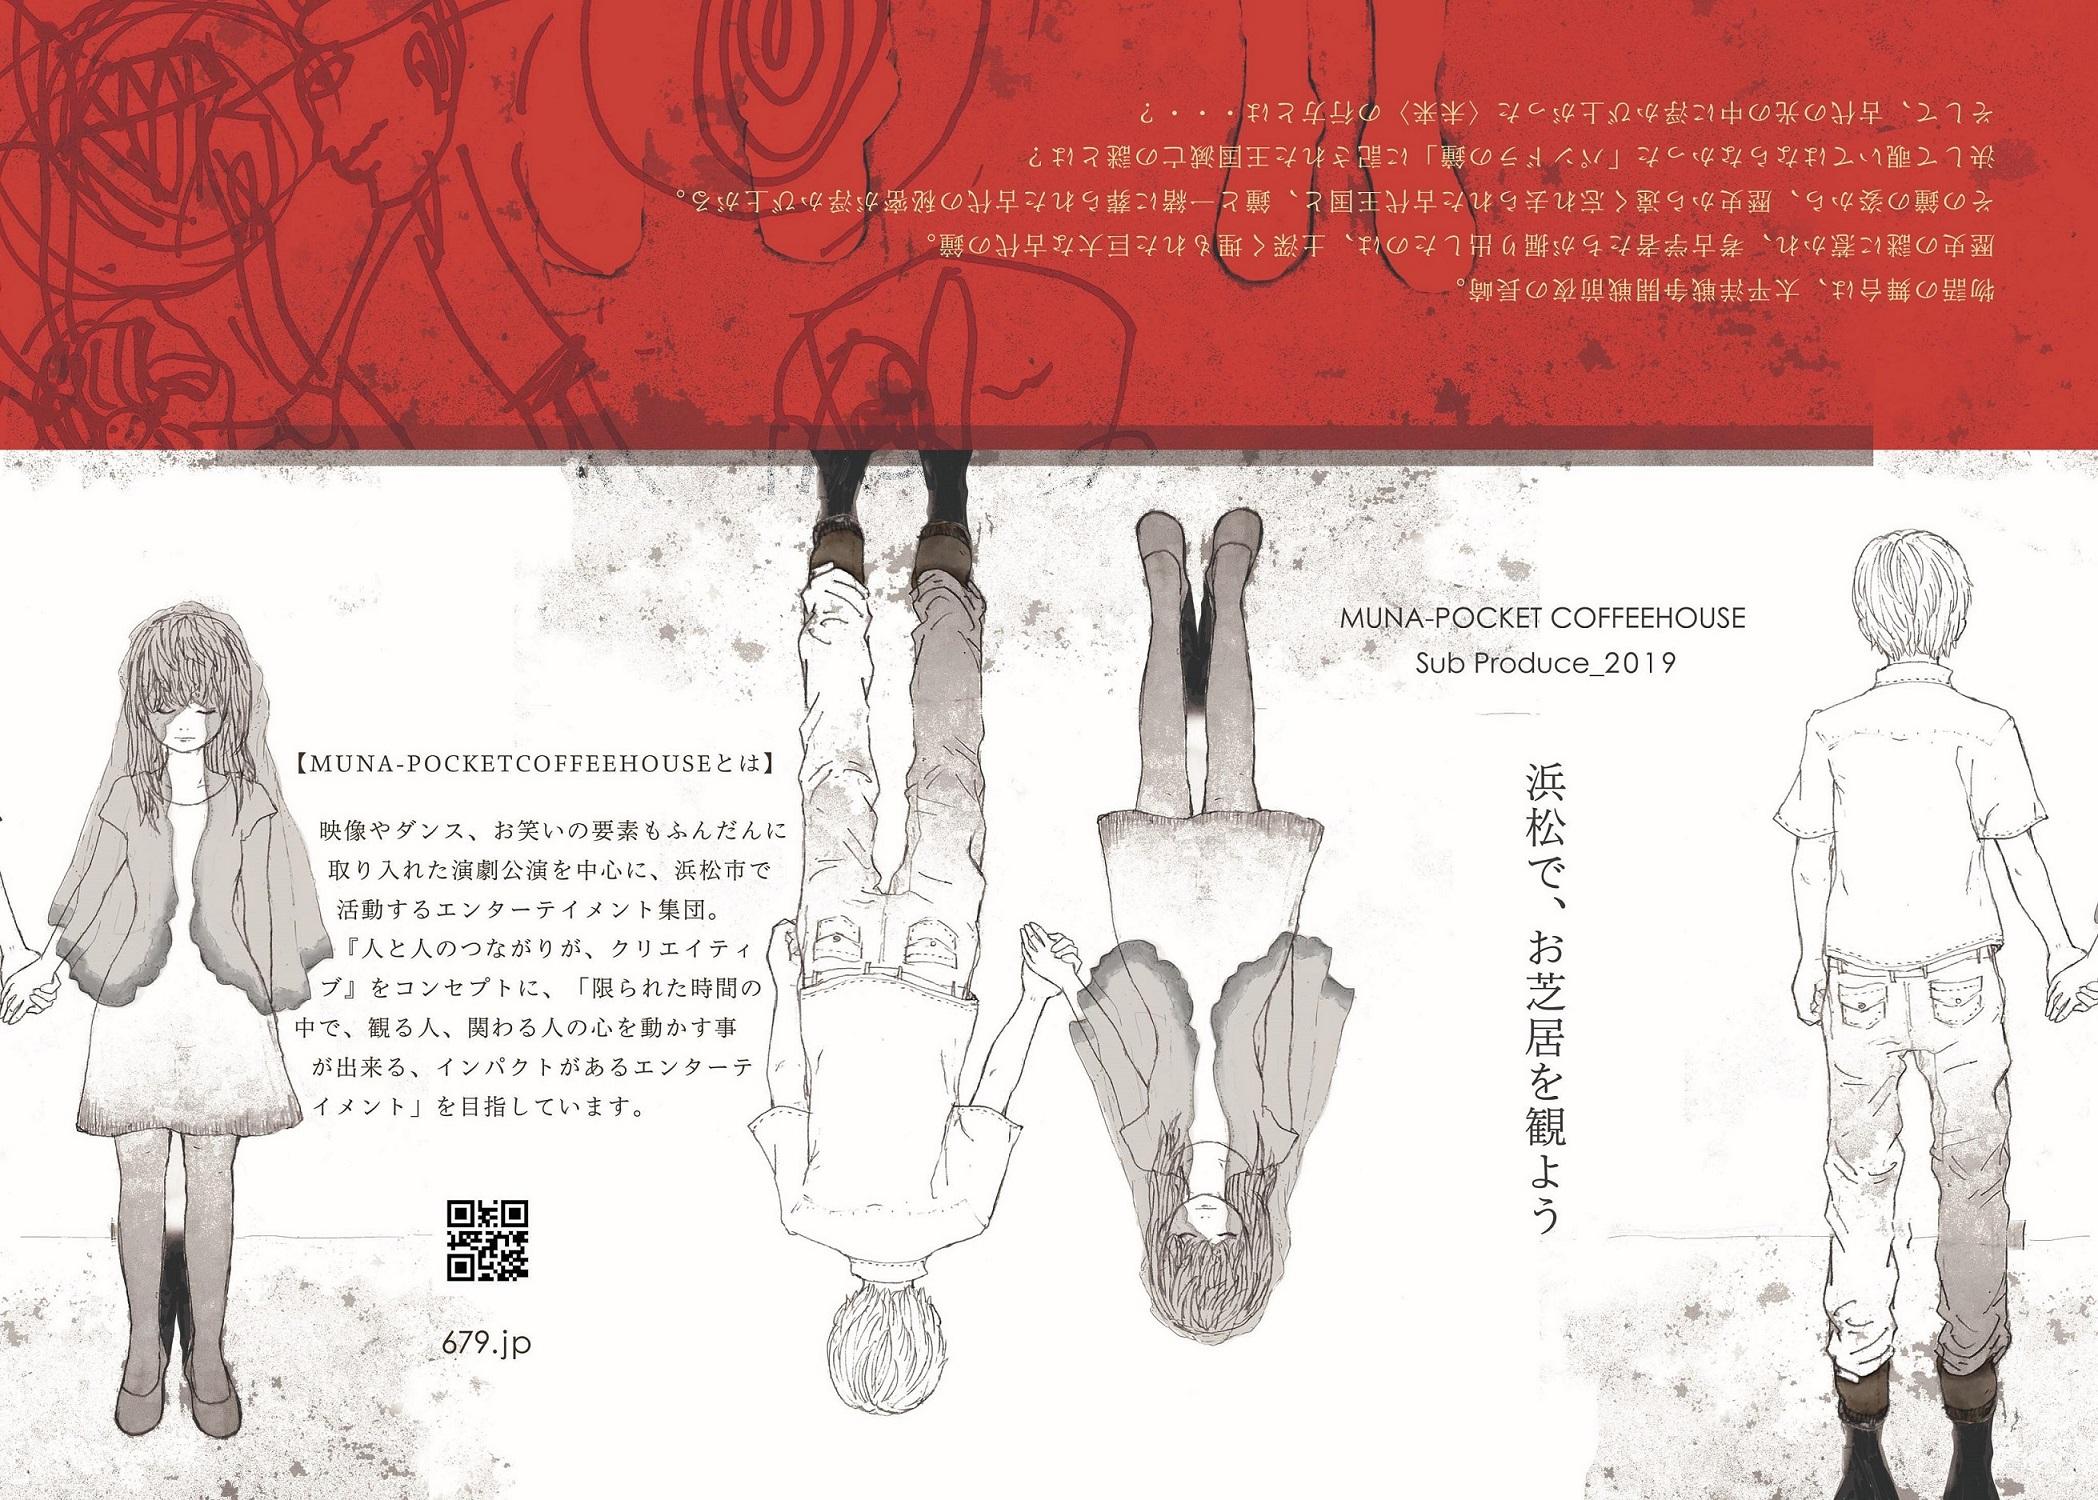 ☆WEB限定割引2回券☆6月2日(日) MUNA-POCKET COFFEEHOUSE(ムナポケ)演劇公演「パンドラの鐘」